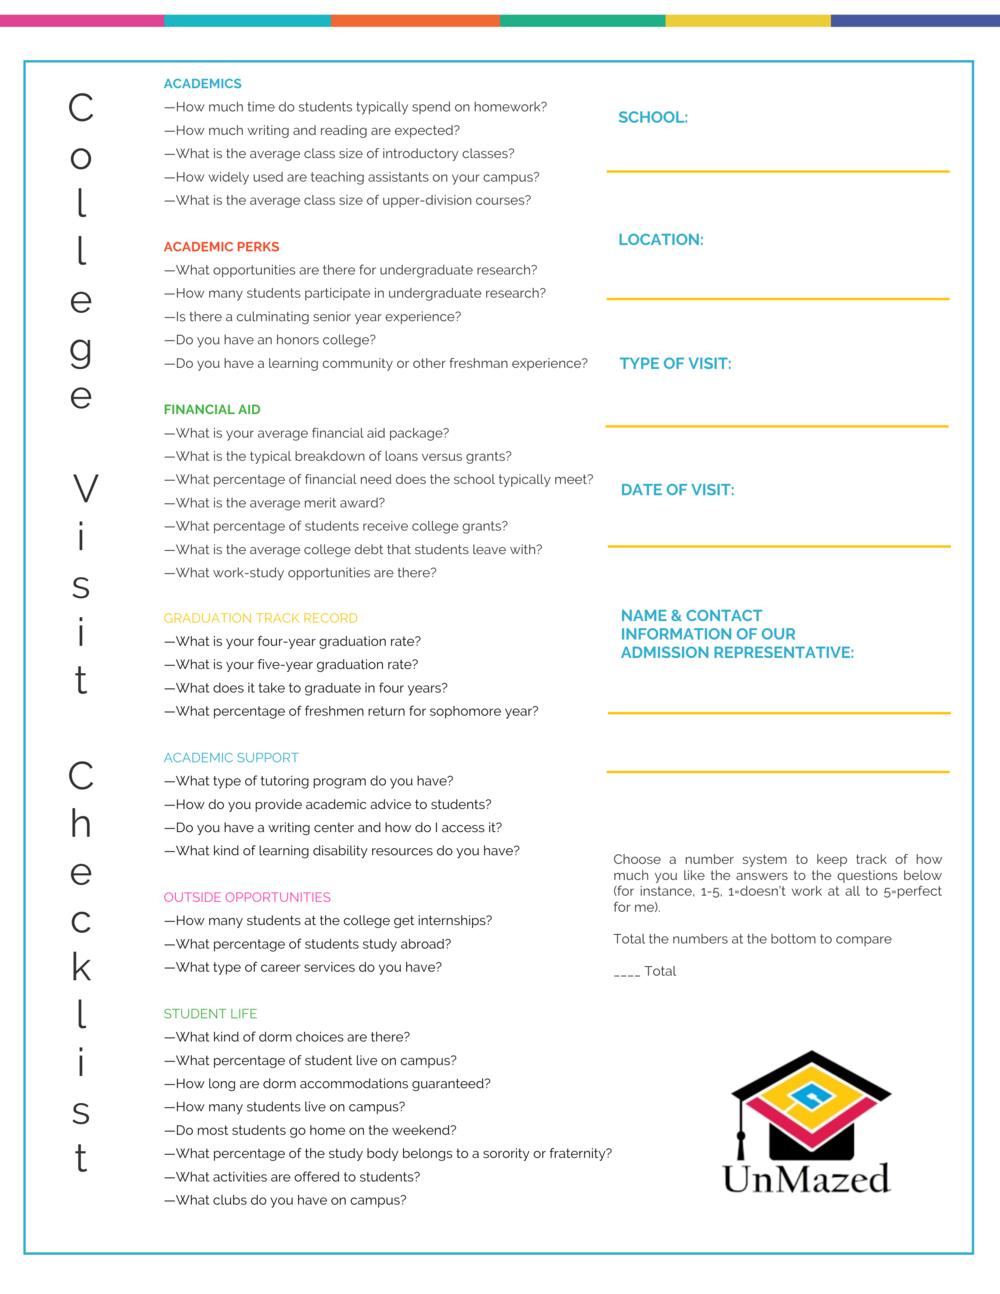 College Visit Checklist Pic